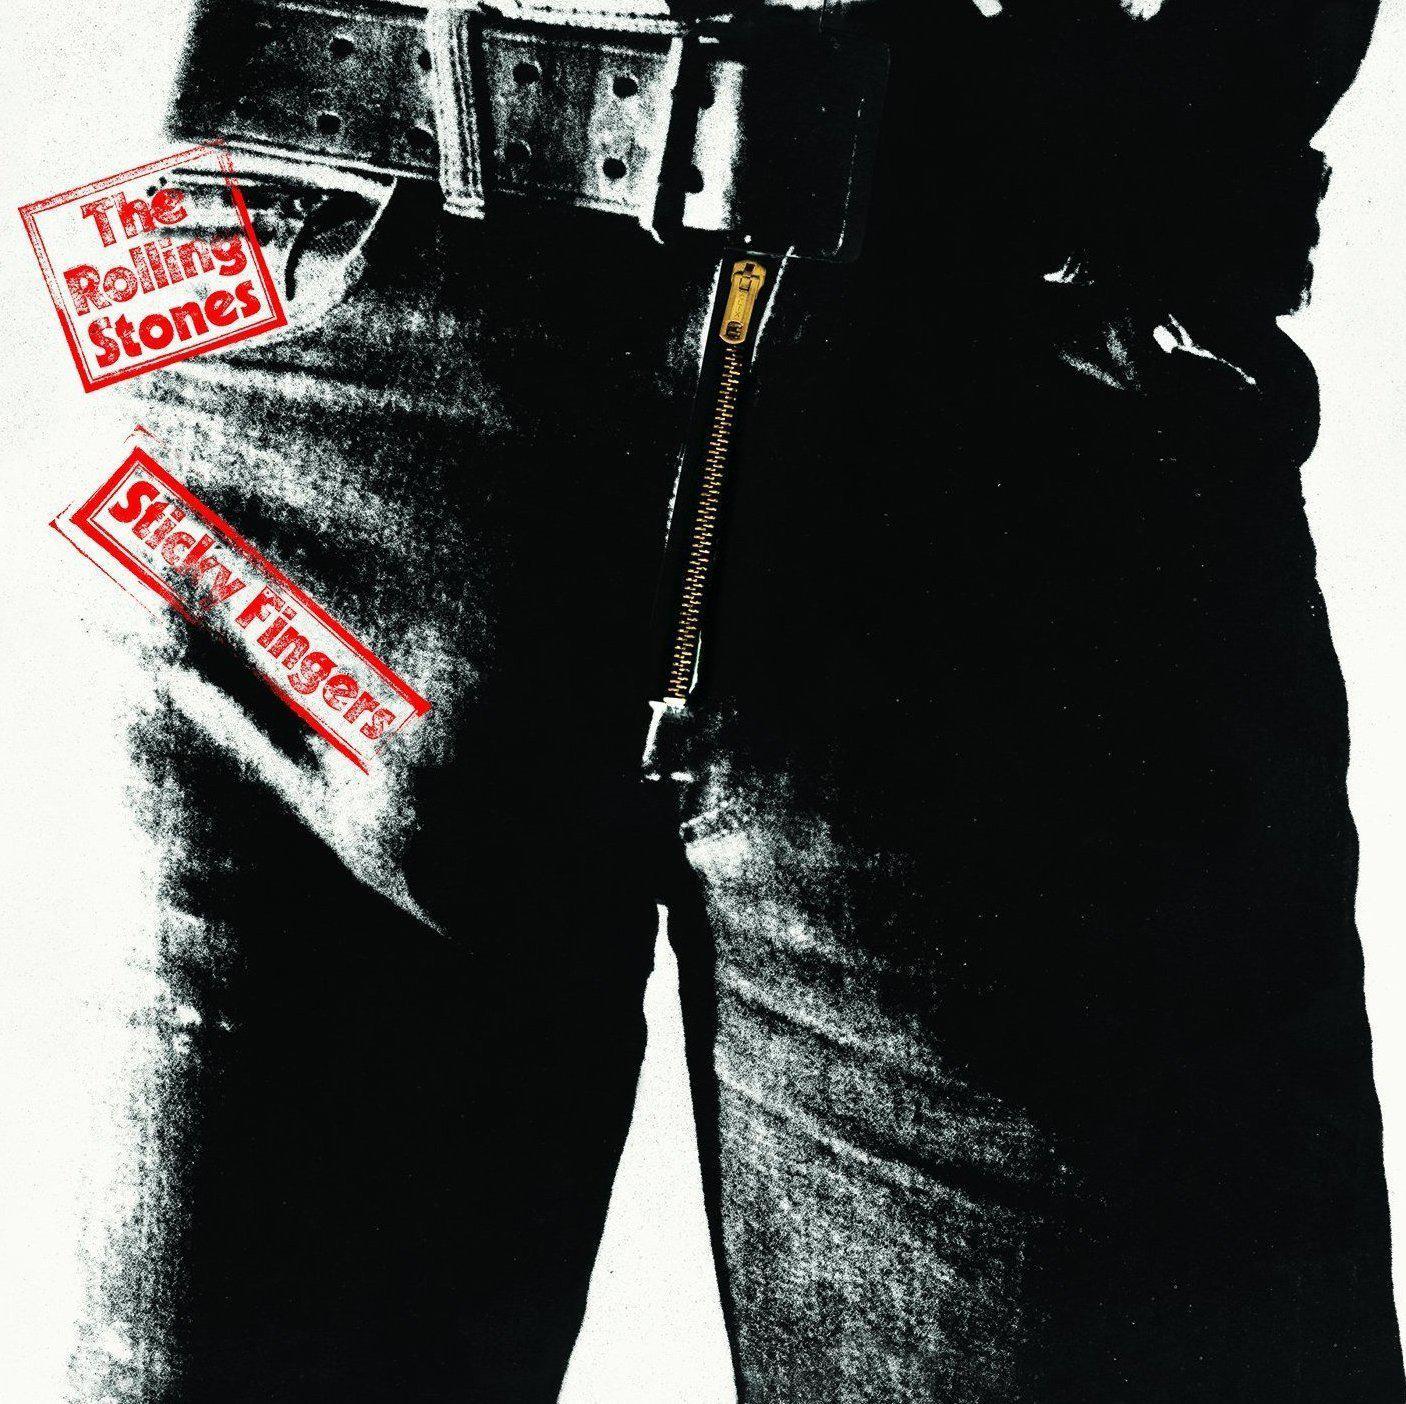 Coffret Rolling Stones Sticky Fingers (2 CD + 1 DVD)